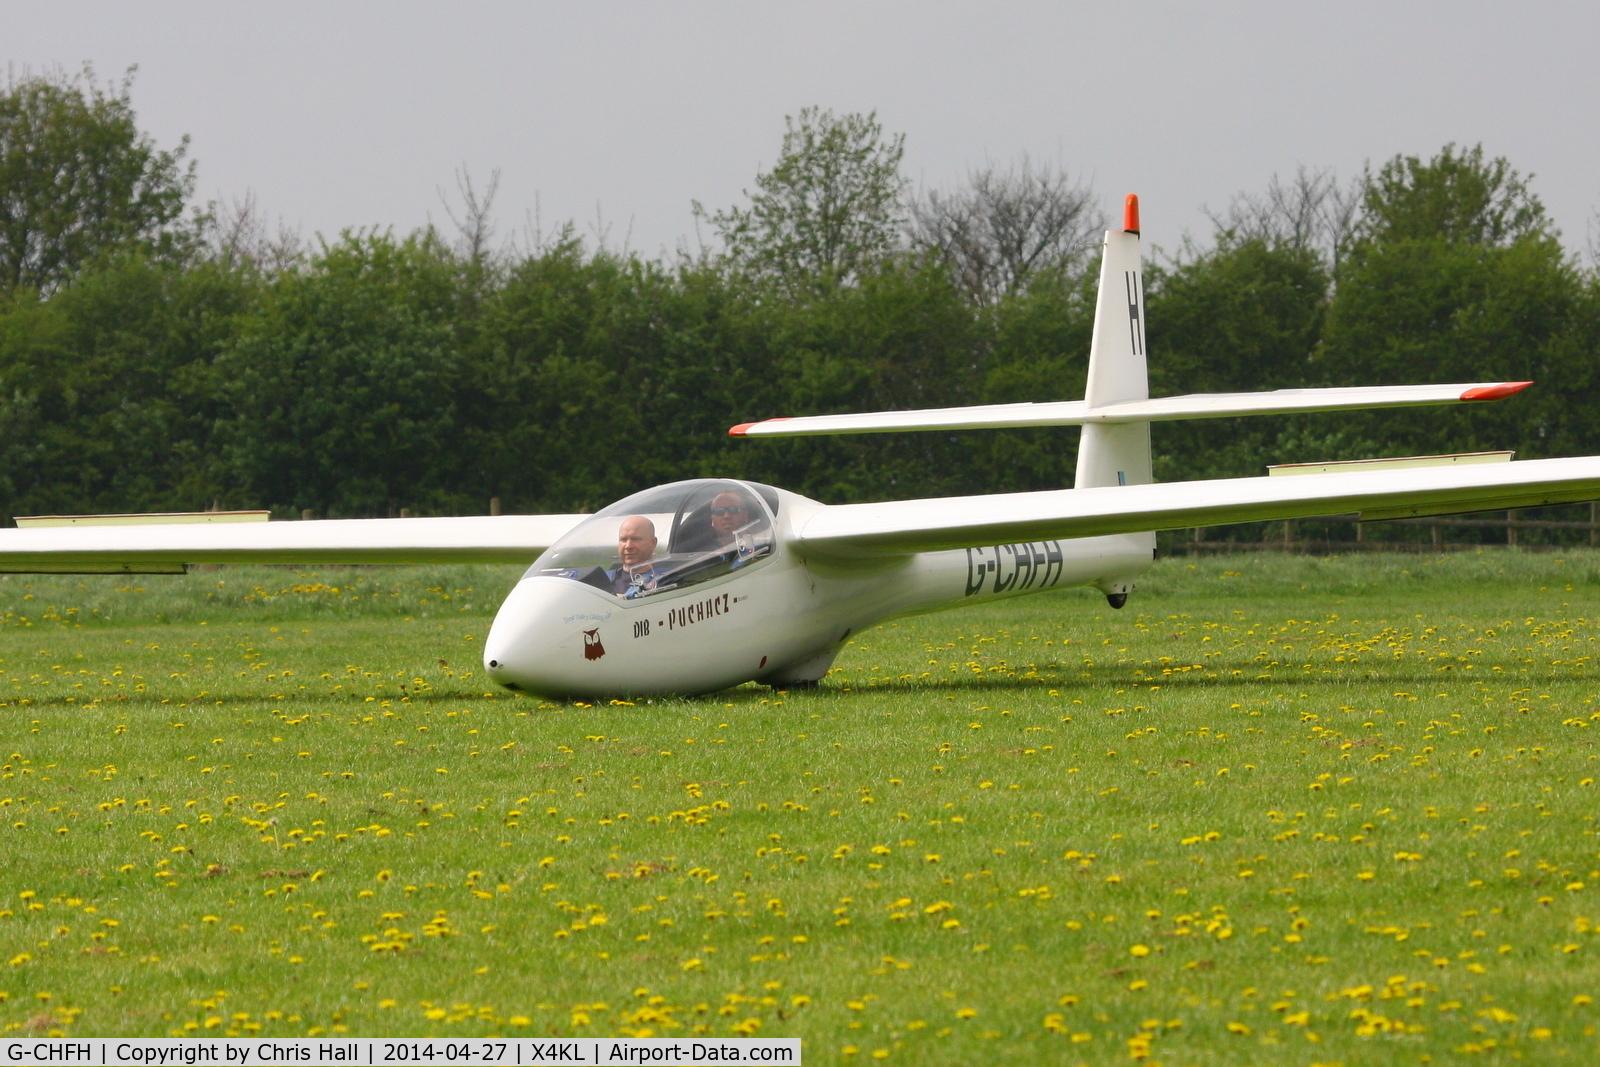 G-CHFH, 1992 PZL-Bielsko SZD-50-3 Puchacz C/N B-2059, Trent Valley Gliding Club, Kirton in Lindsay